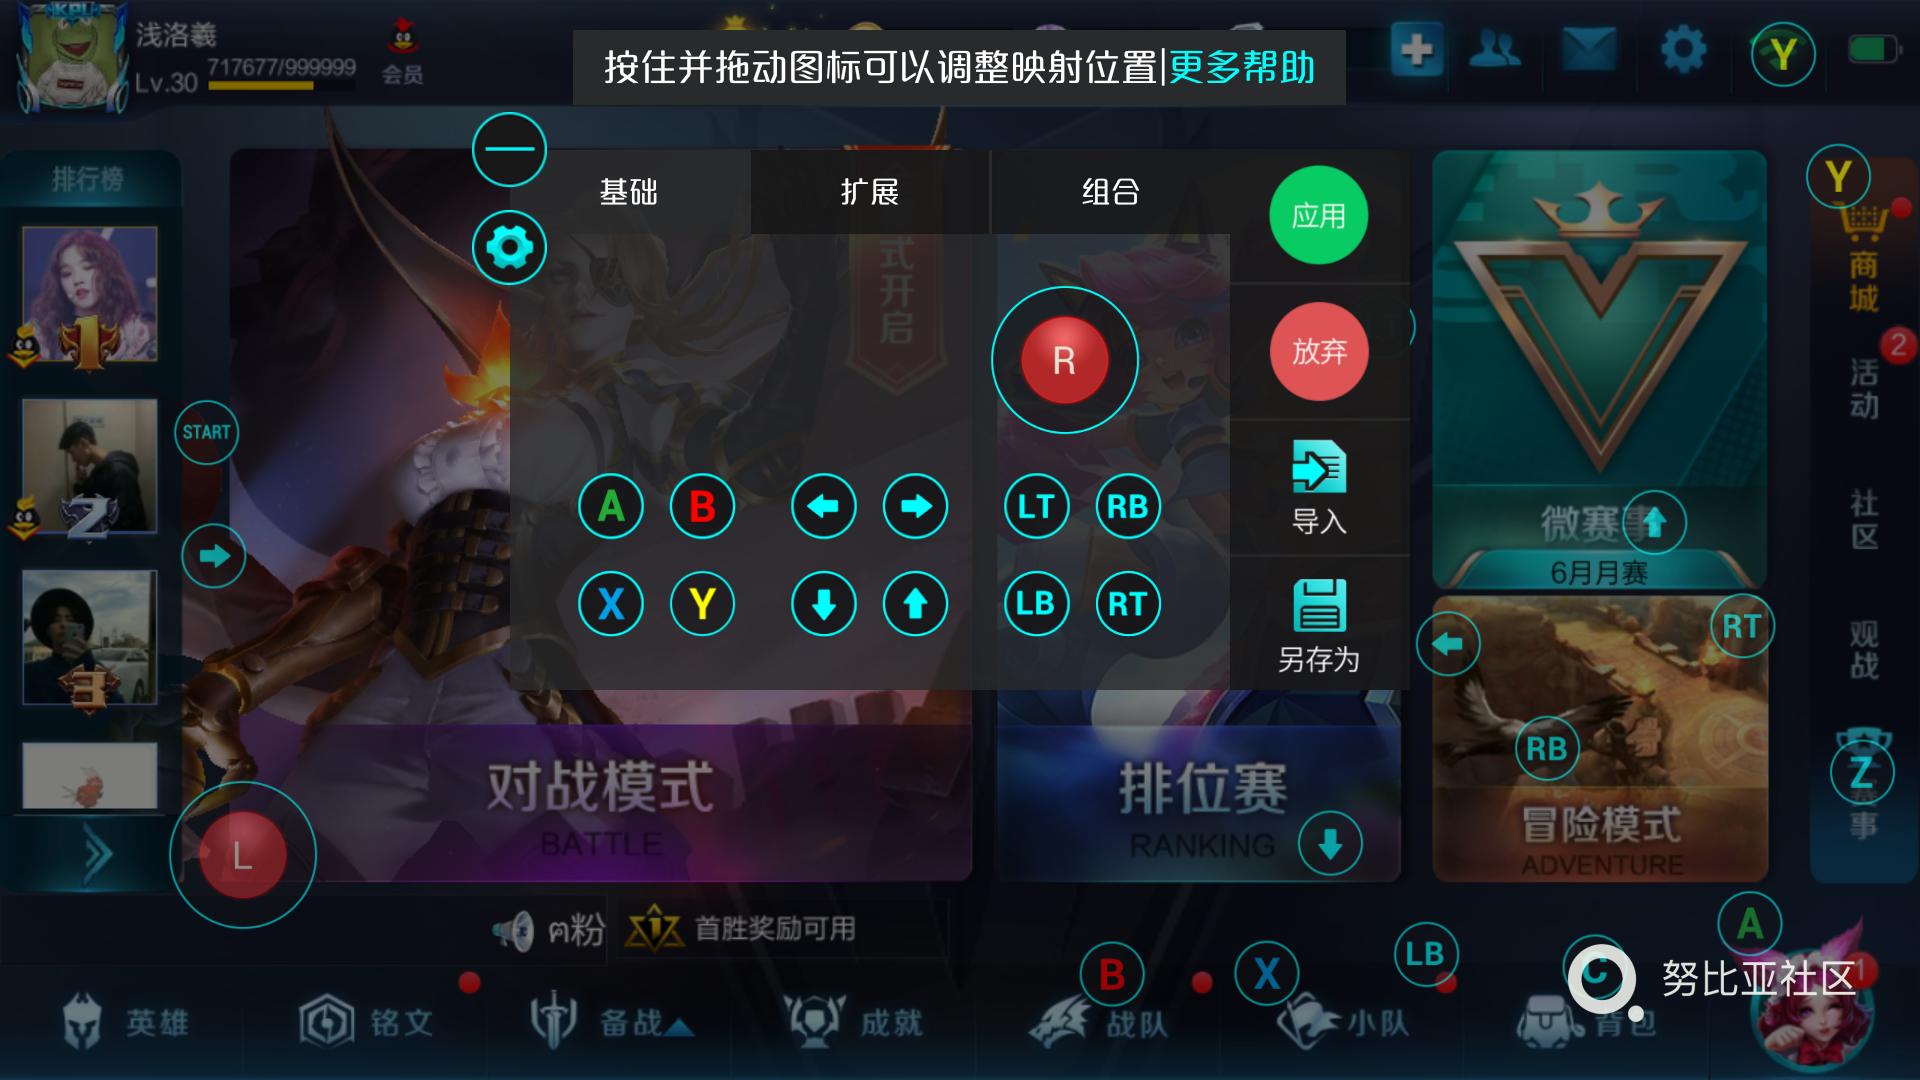 Screenshot_2018-06-10-01-05-03.png